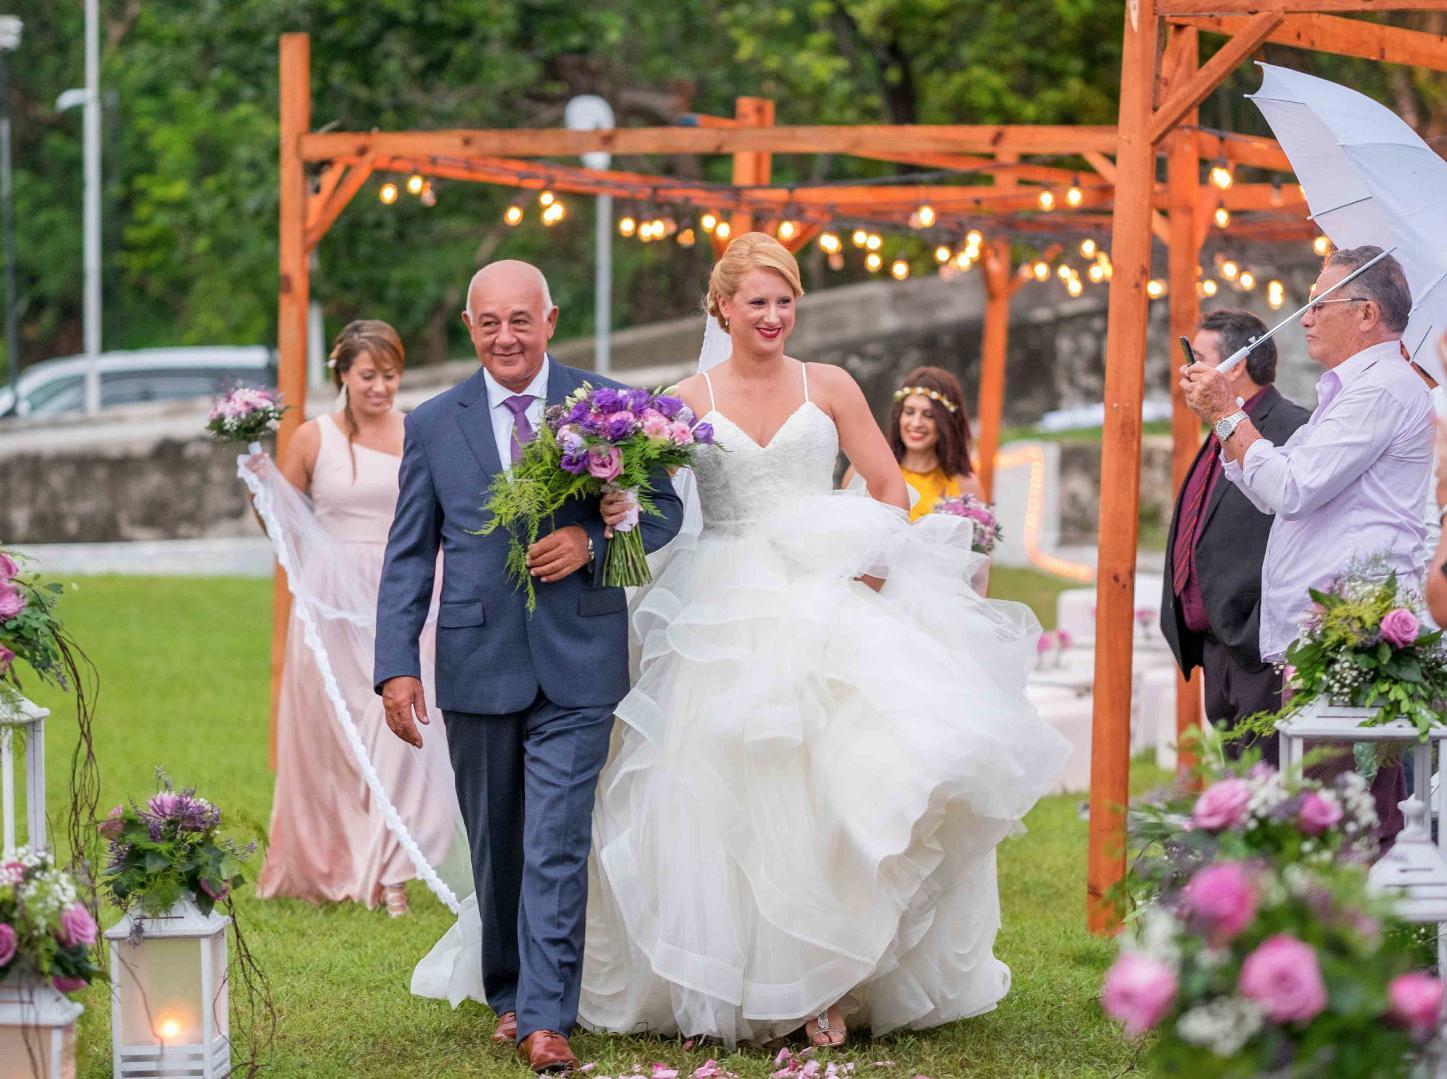 bodas-sin-clasificar-sin-tema-cuba-35771.jpg